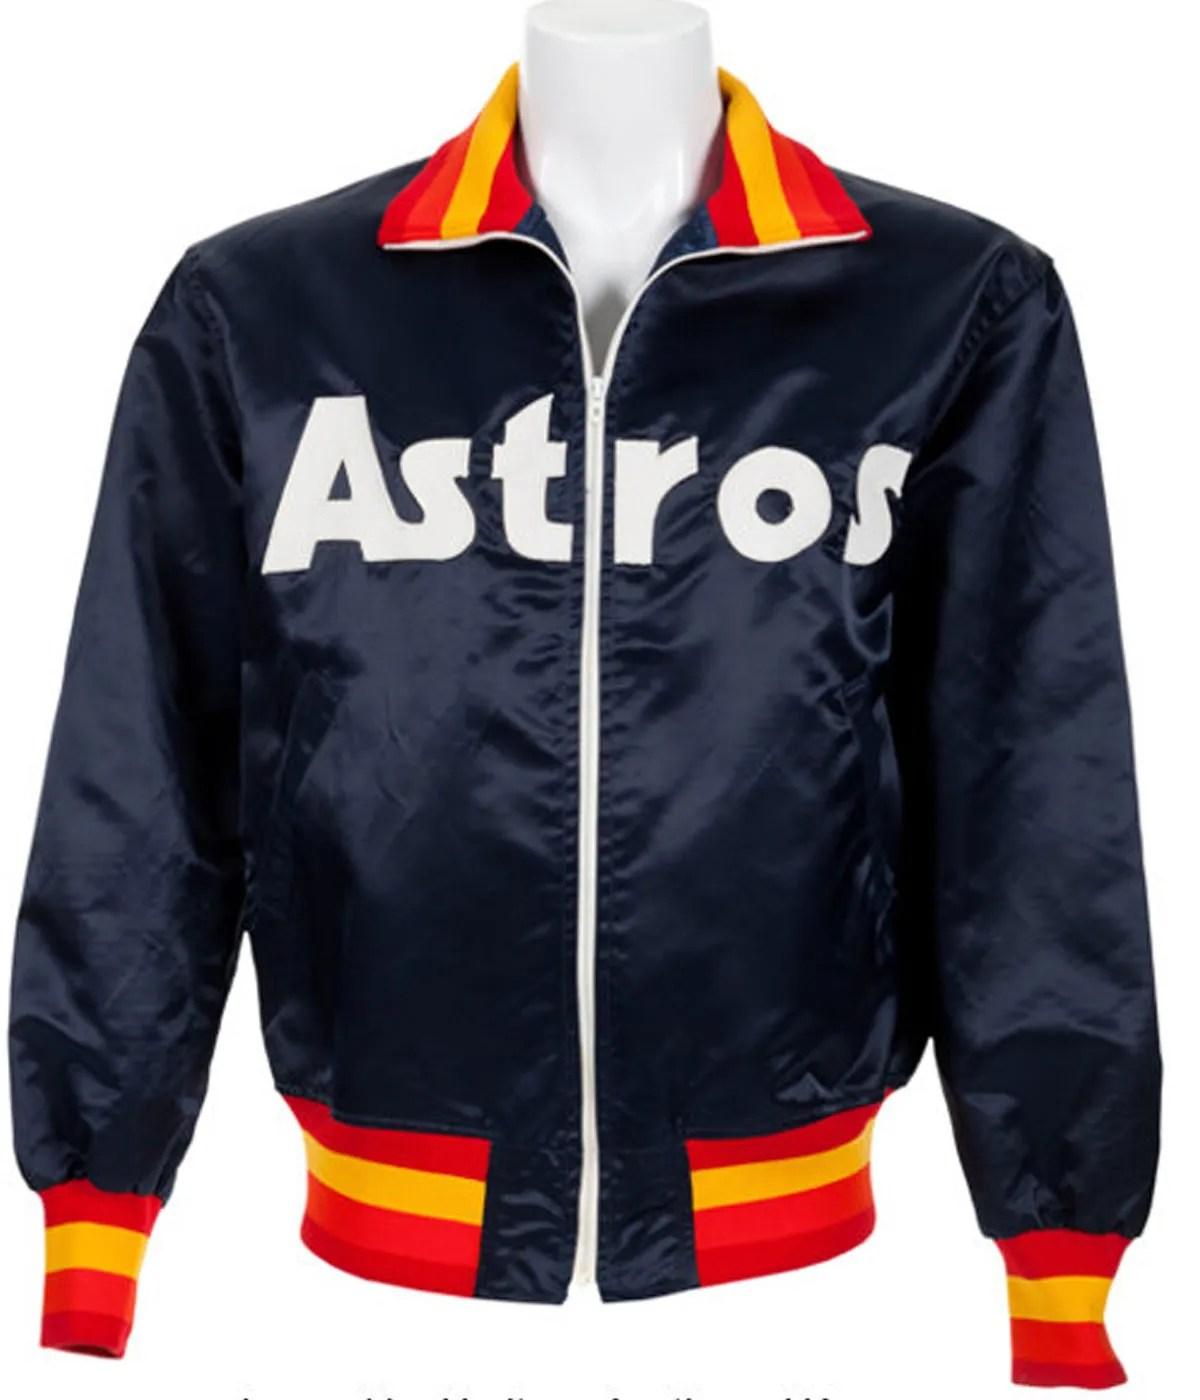 1980s-houston-astros-baseball-jacket